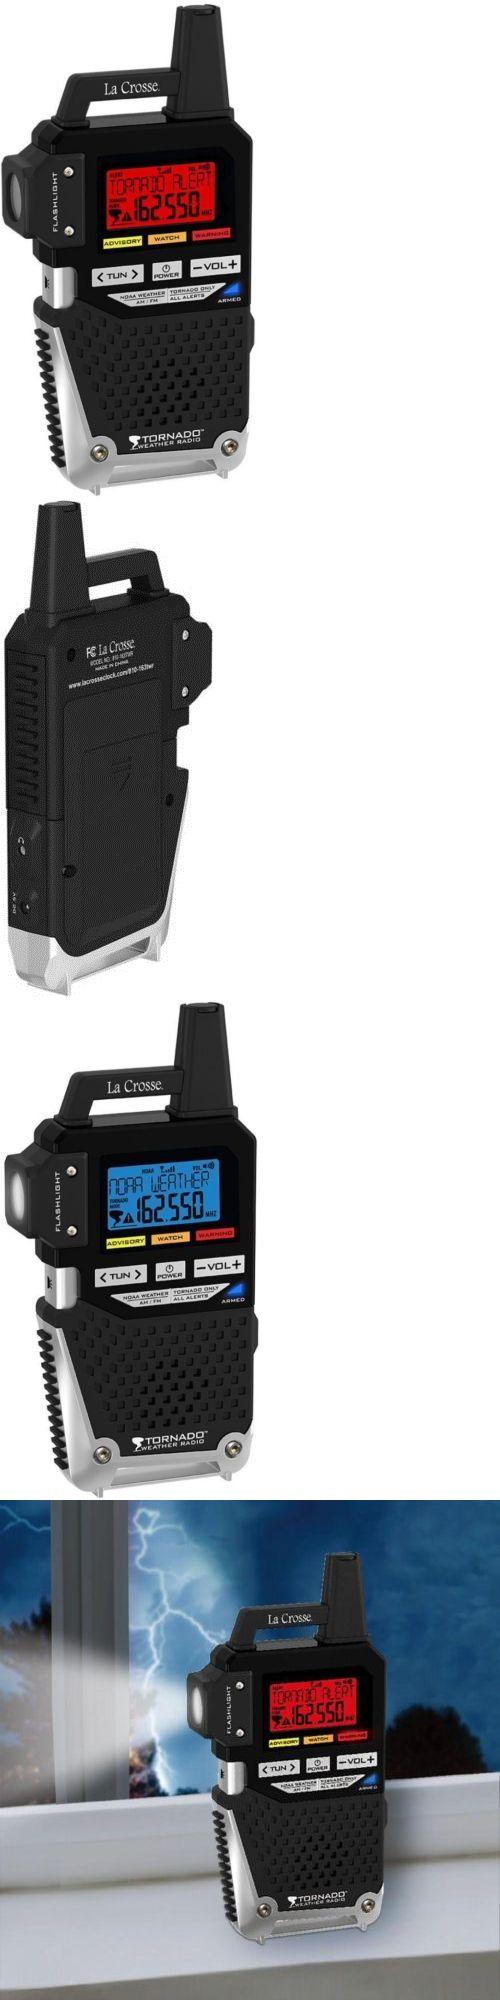 Portable AM FM Radios: La Crosse Technology Noaa Am Fm Weather Alert Radio With 1-Button Tornado Alert -> BUY IT NOW ONLY: $65.99 on eBay!